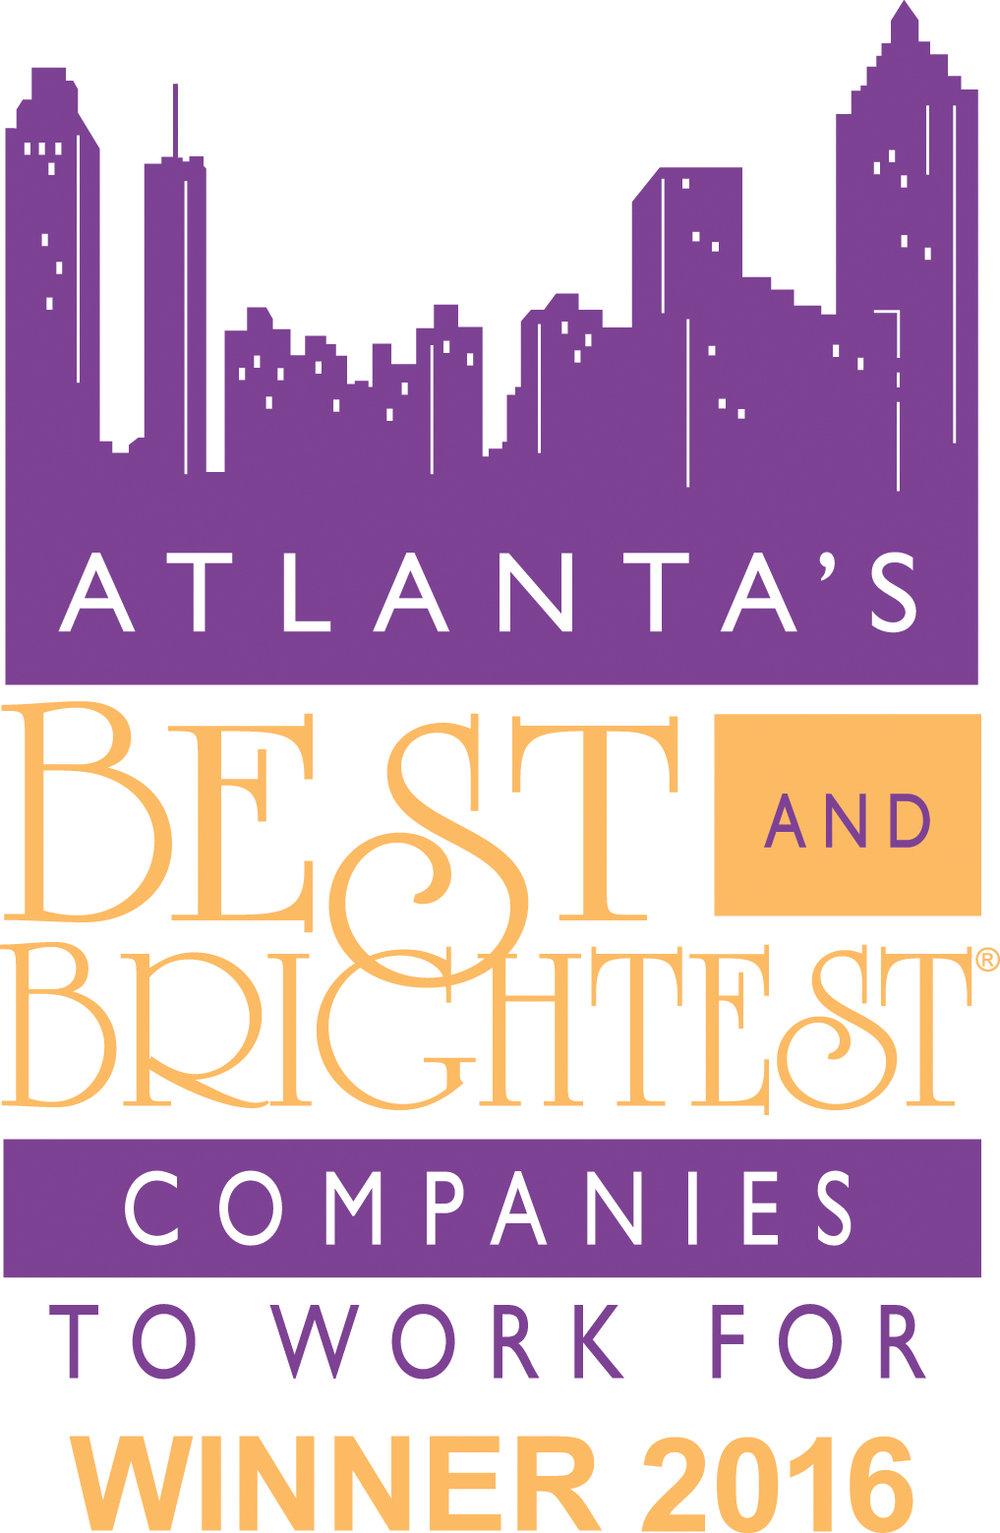 AtlantaBBlogoWin16_RGB.jpg